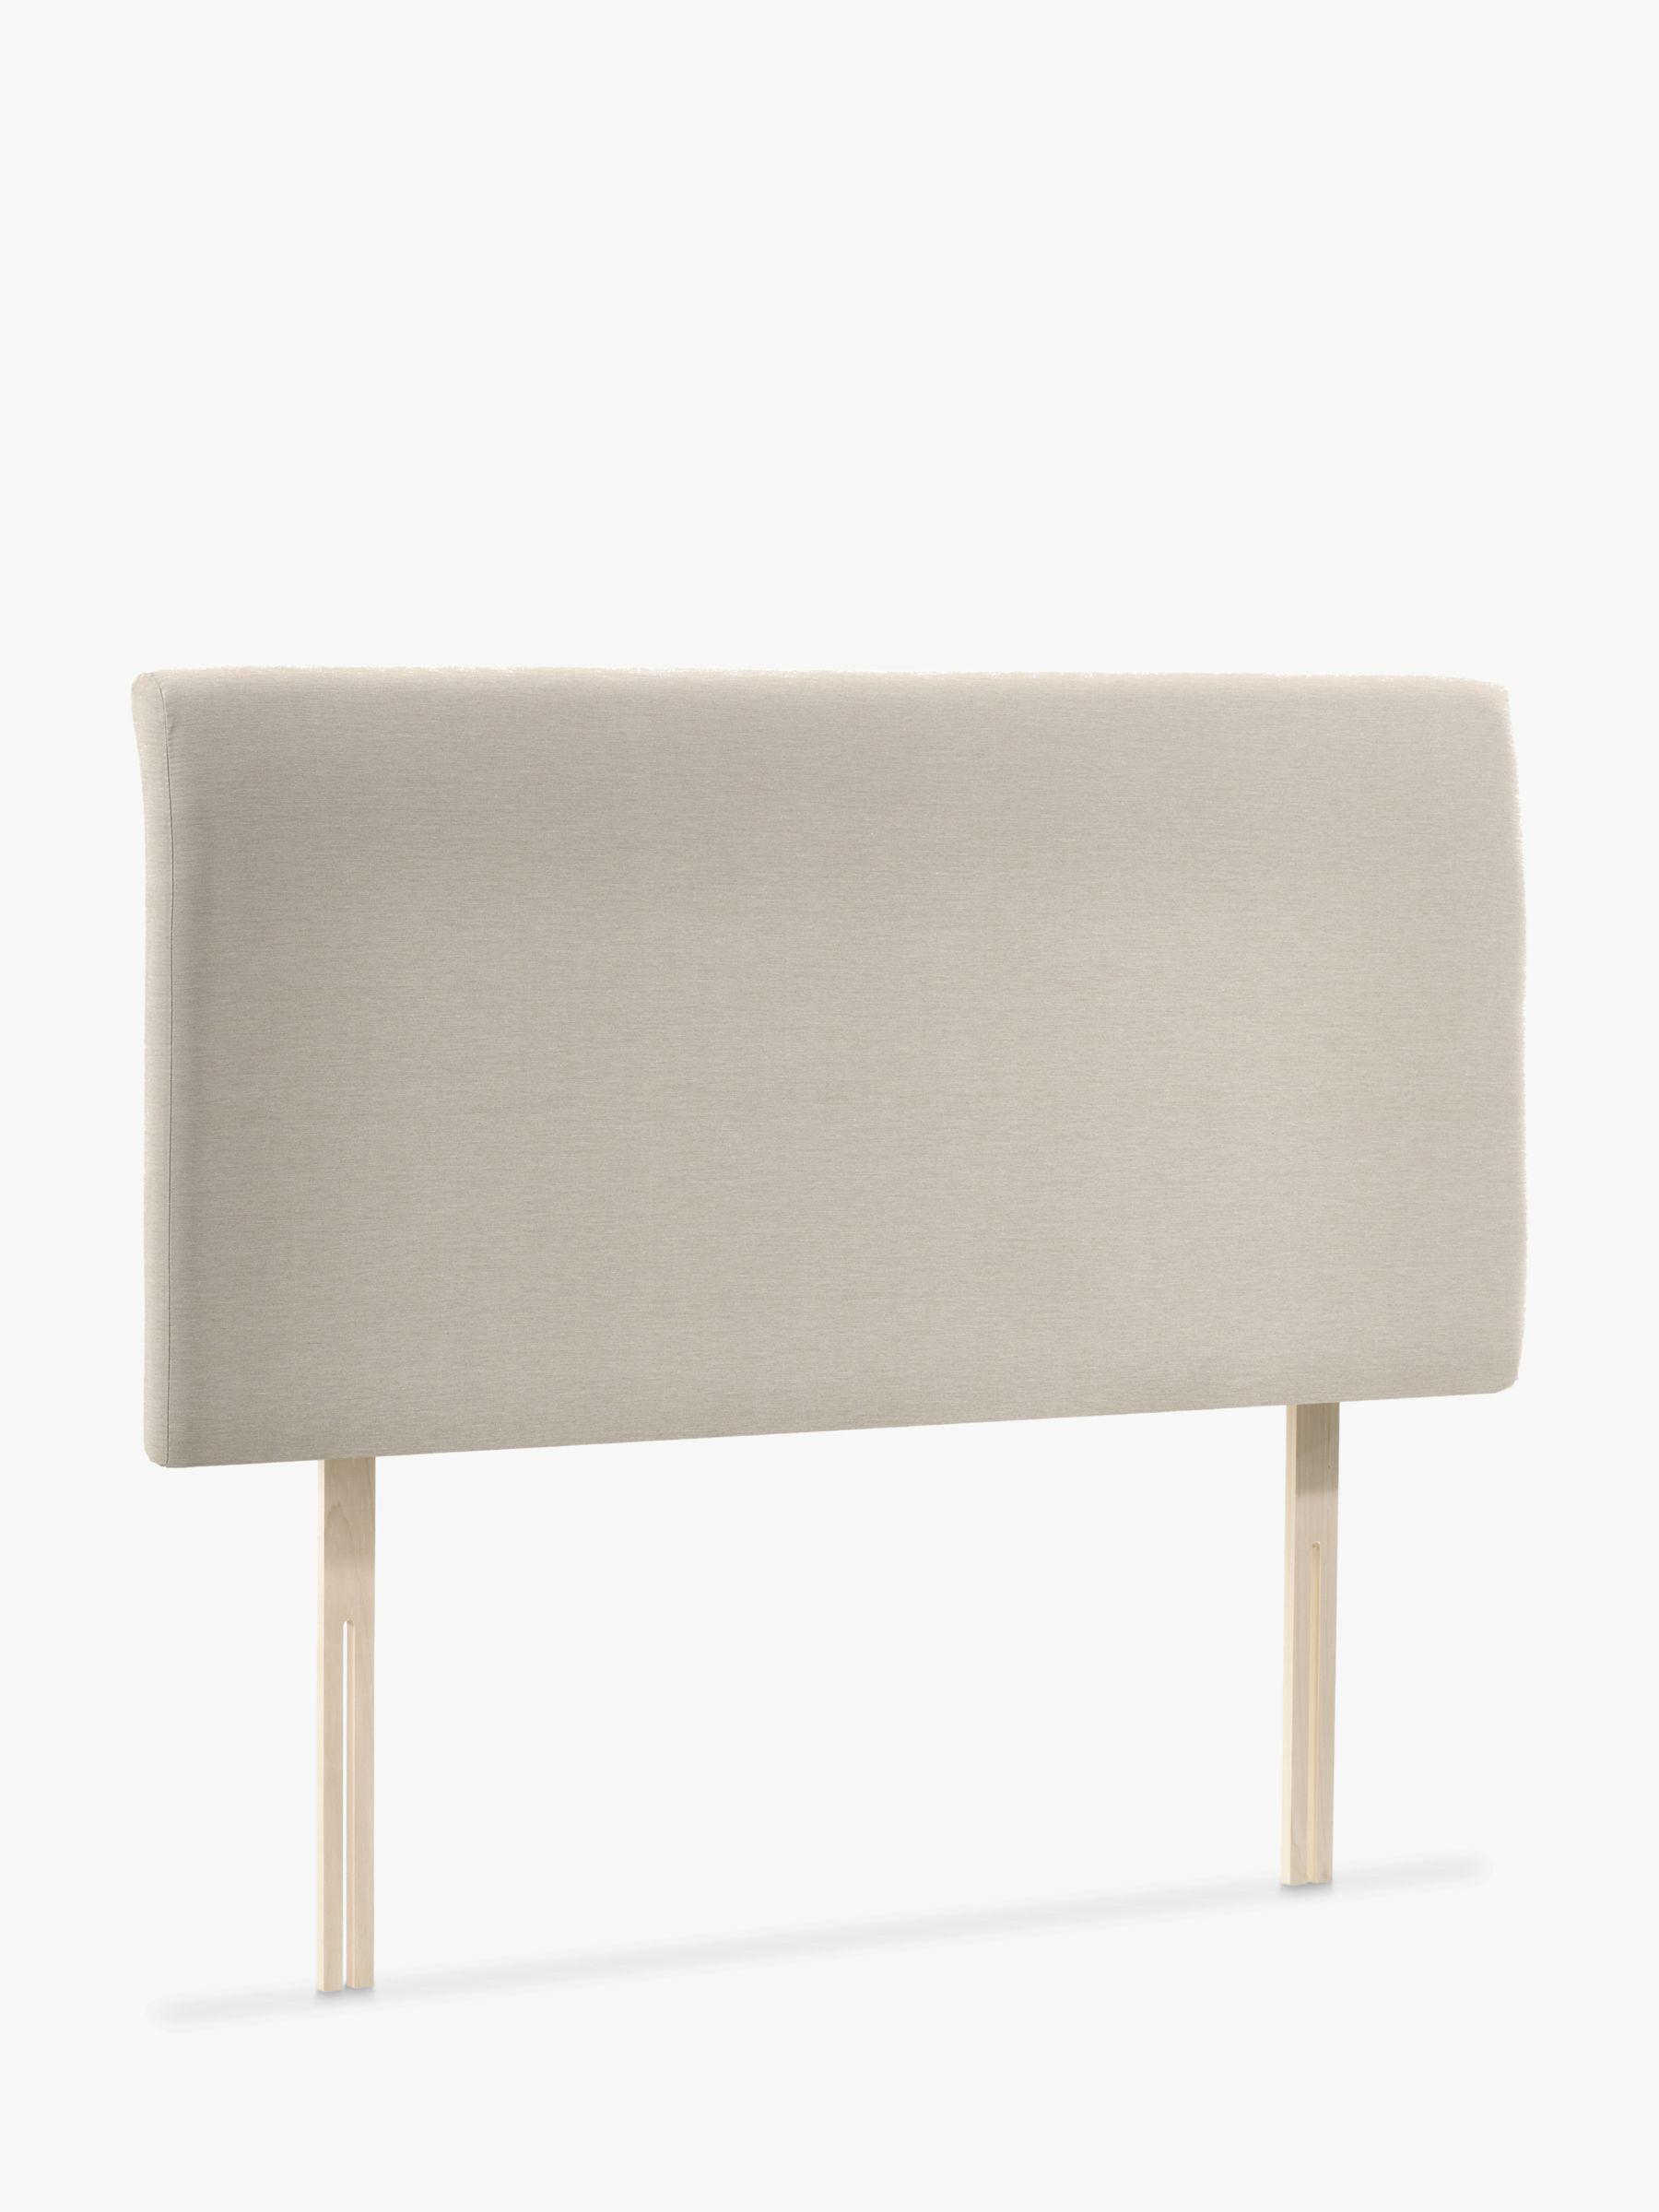 John Lewis & Partners Bedford Upholstered Headboard, Double, FSC Certified (Softwood)